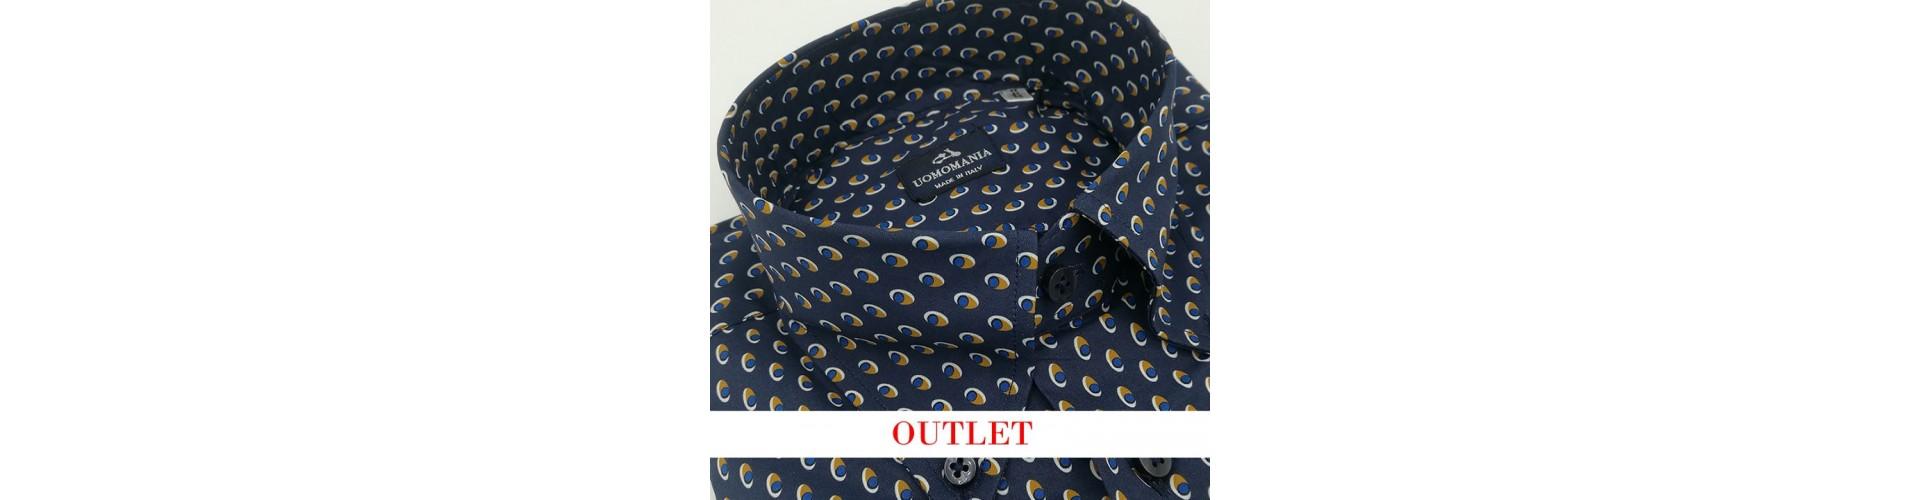 Outlet camisas para hombre